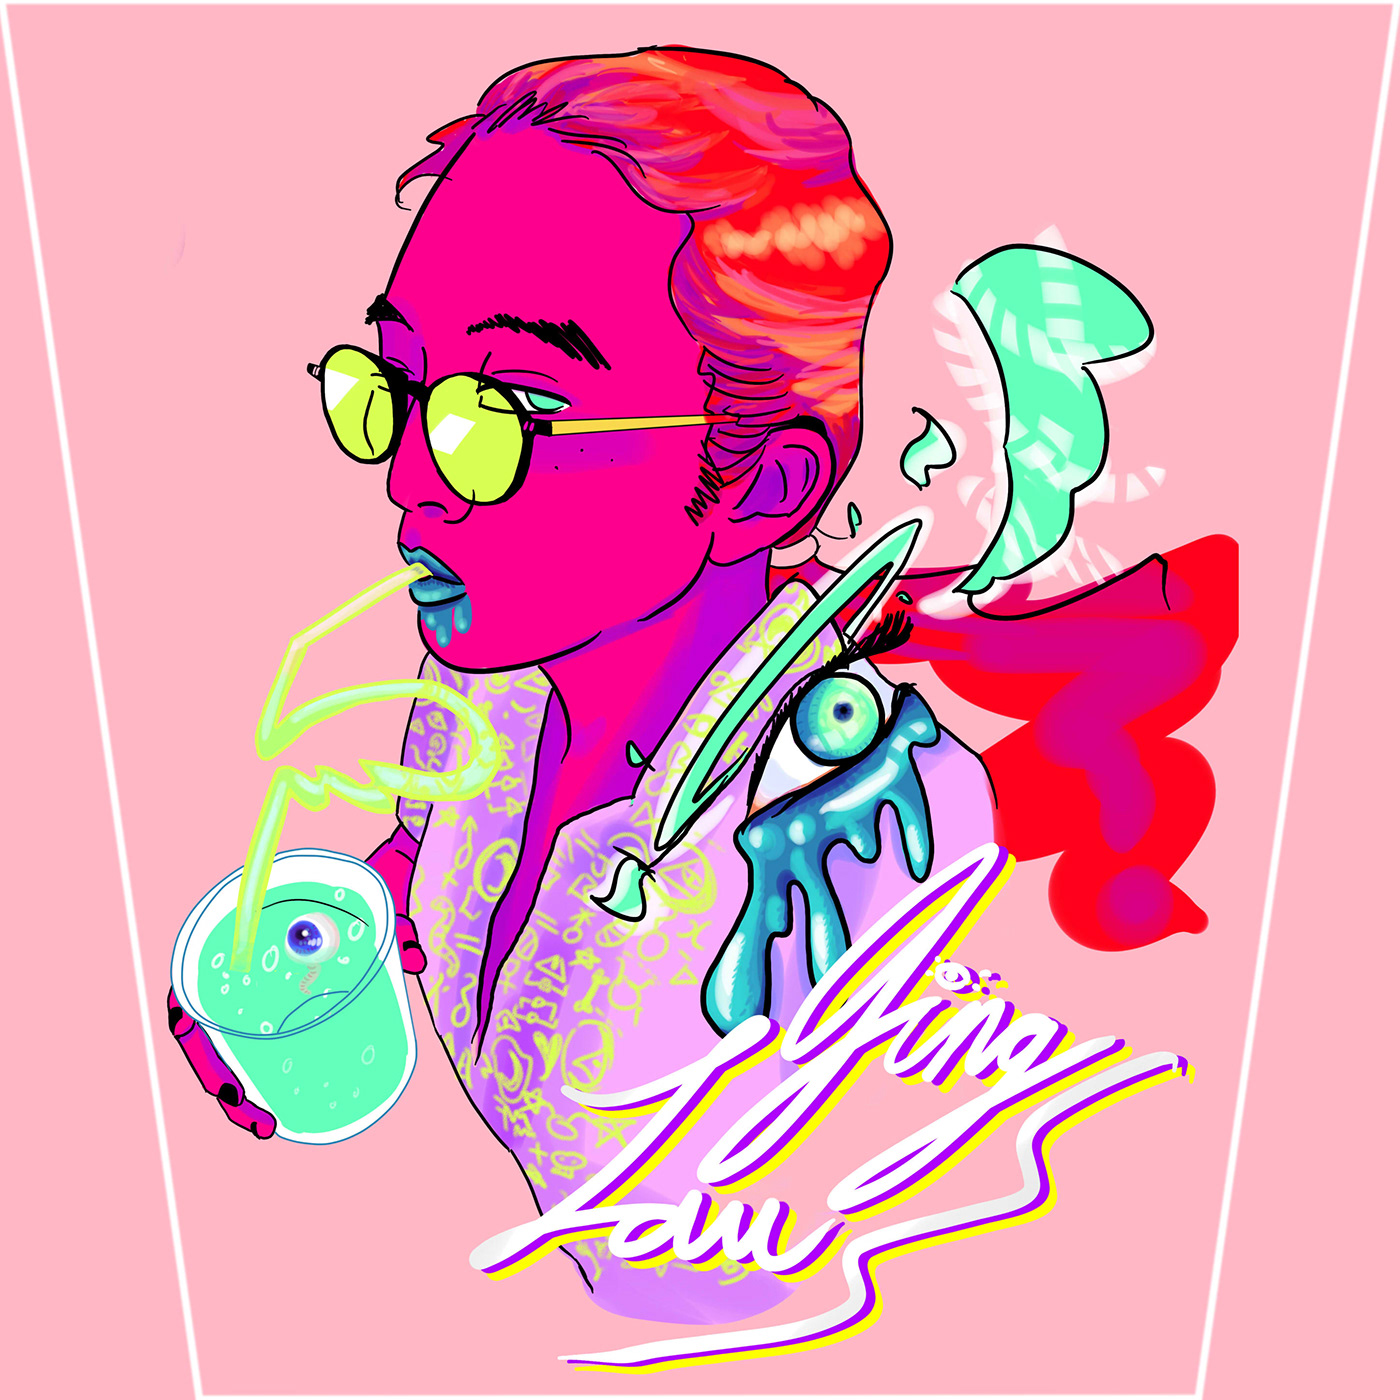 Digital Art  graphic design  Pop Art bright colors self portrait Poster Design